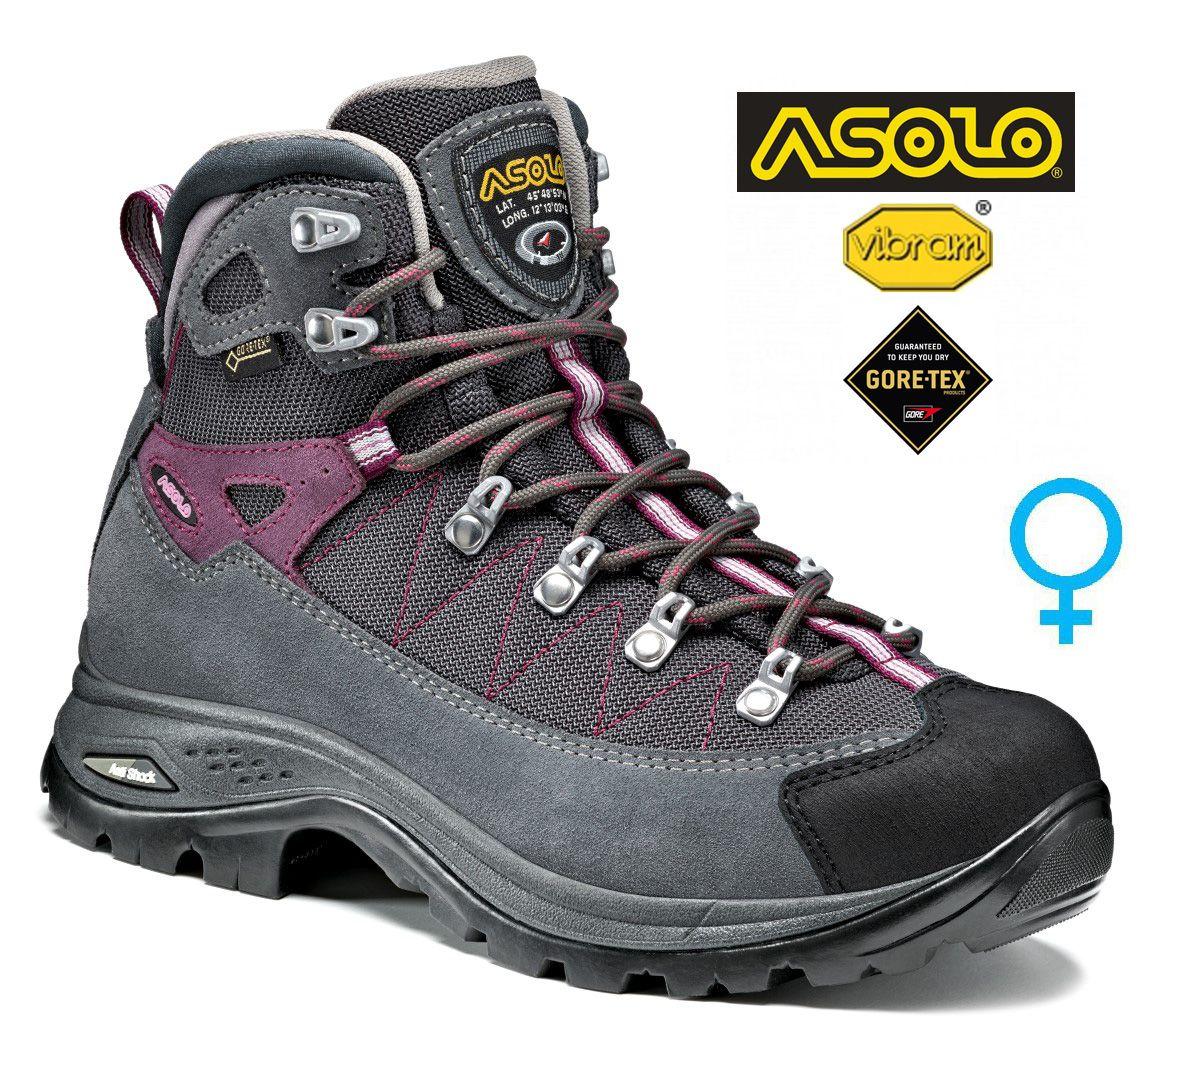 Tazz-Sport - Asolo Finder GV ML grey / gunmetal / grapeade dámská treková bota